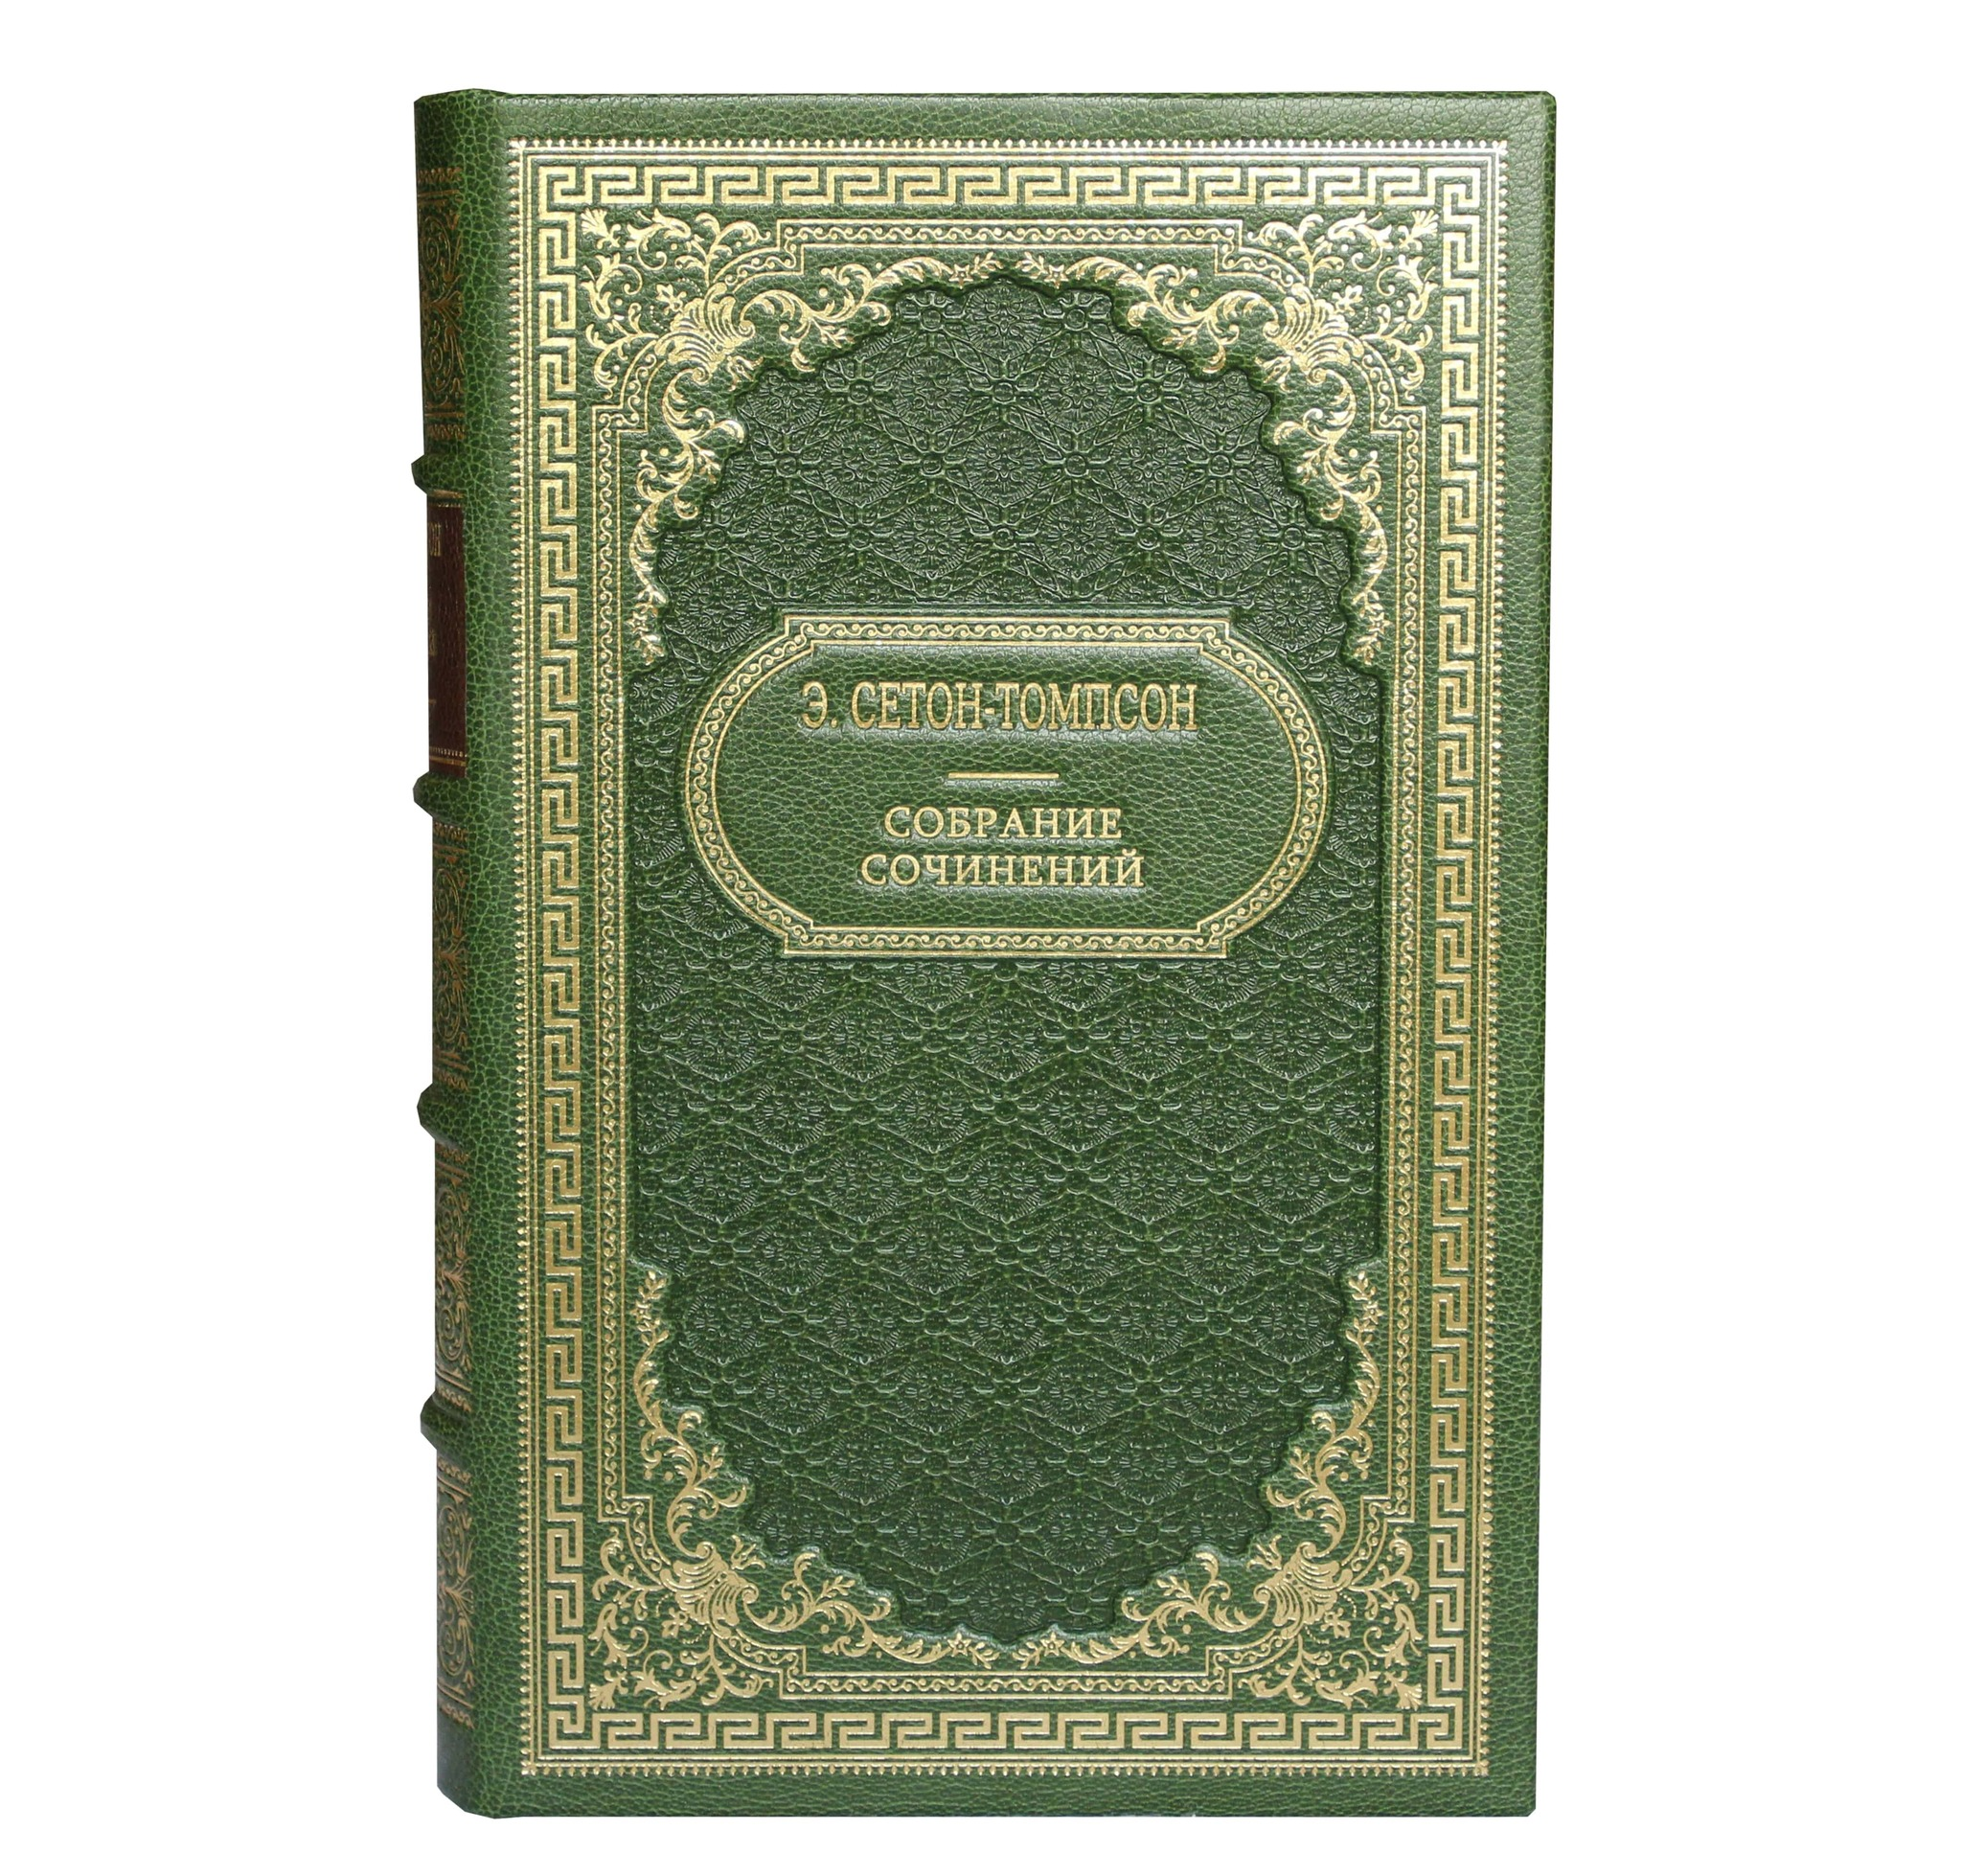 Сетон-Томпсон Э. Собрание сочинений в 4 томах